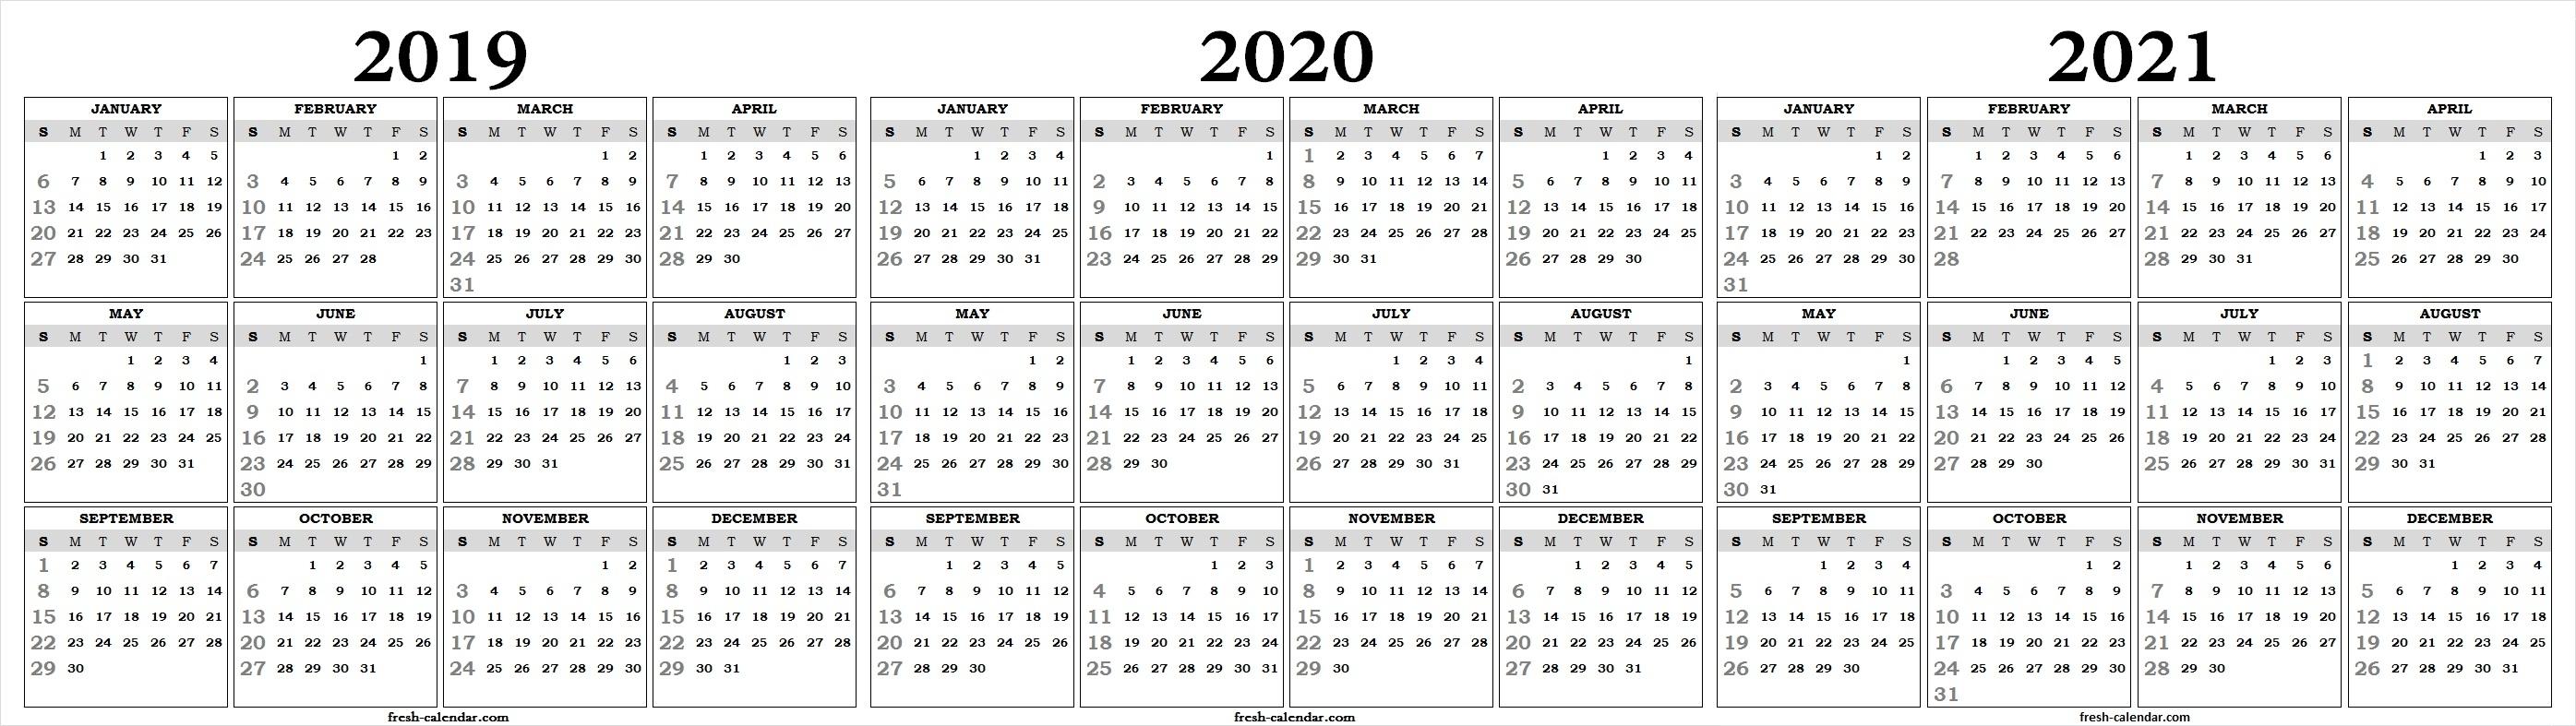 Three Yearly 2019 2020 2021 Calendar Printable Free | Blank Template regarding Printable 3 Year Calendar 2019 2020 2021